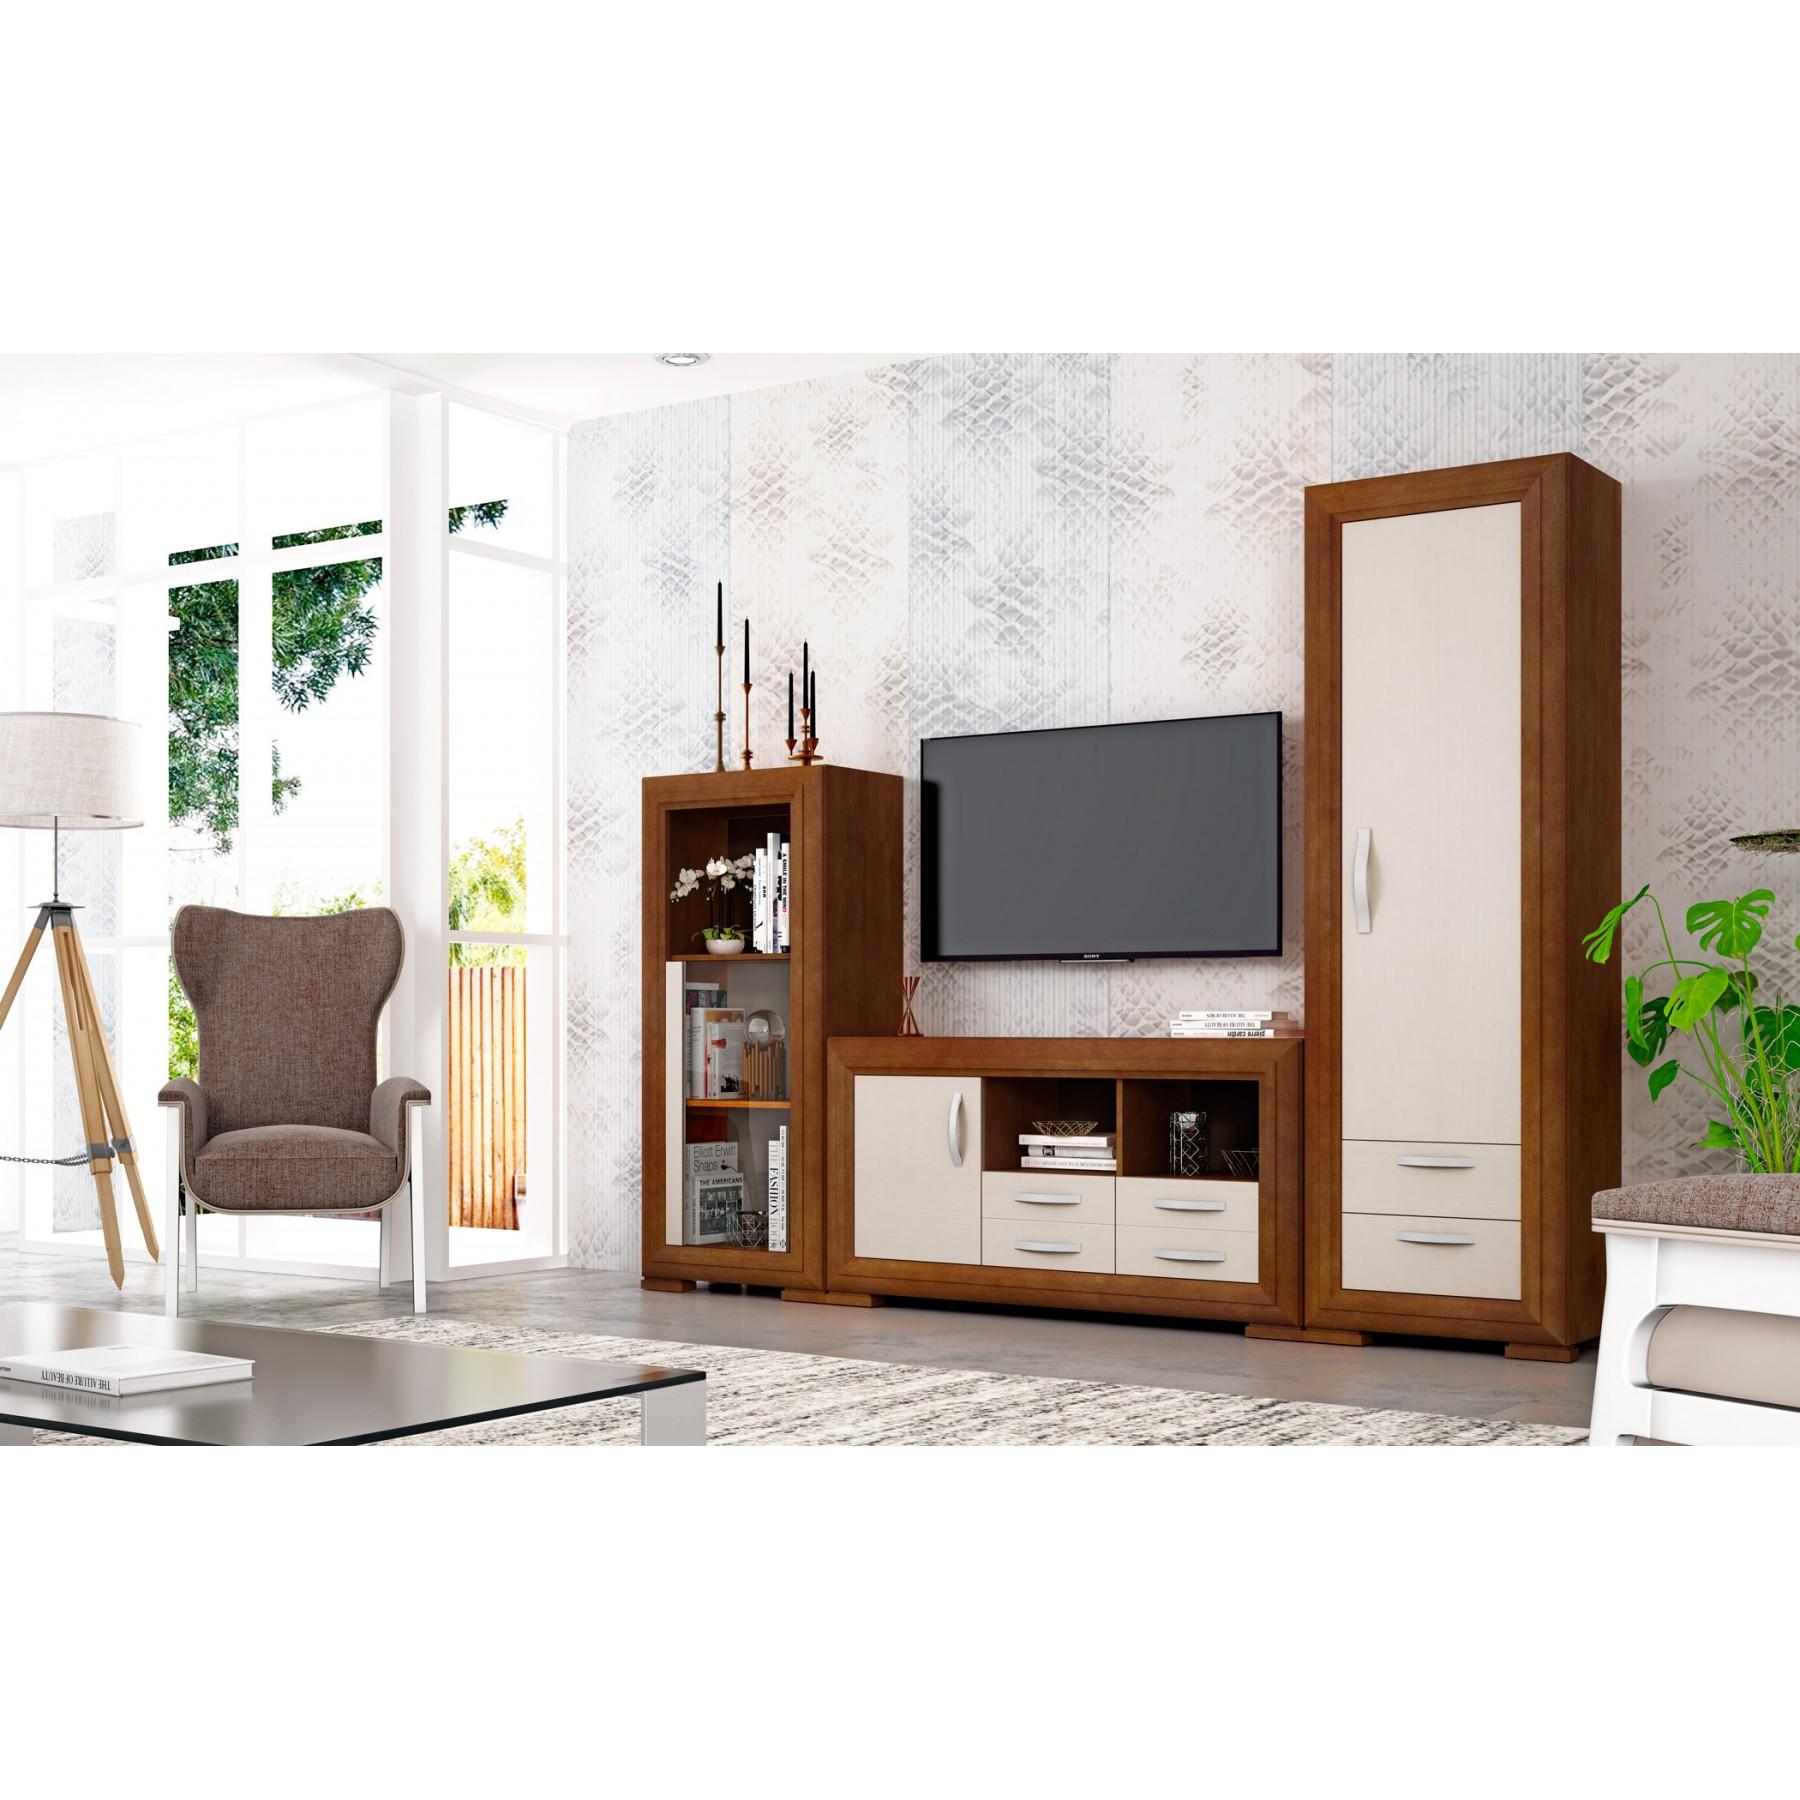 Muebles De Sal N Modelo It Lica # Muebles Hispania